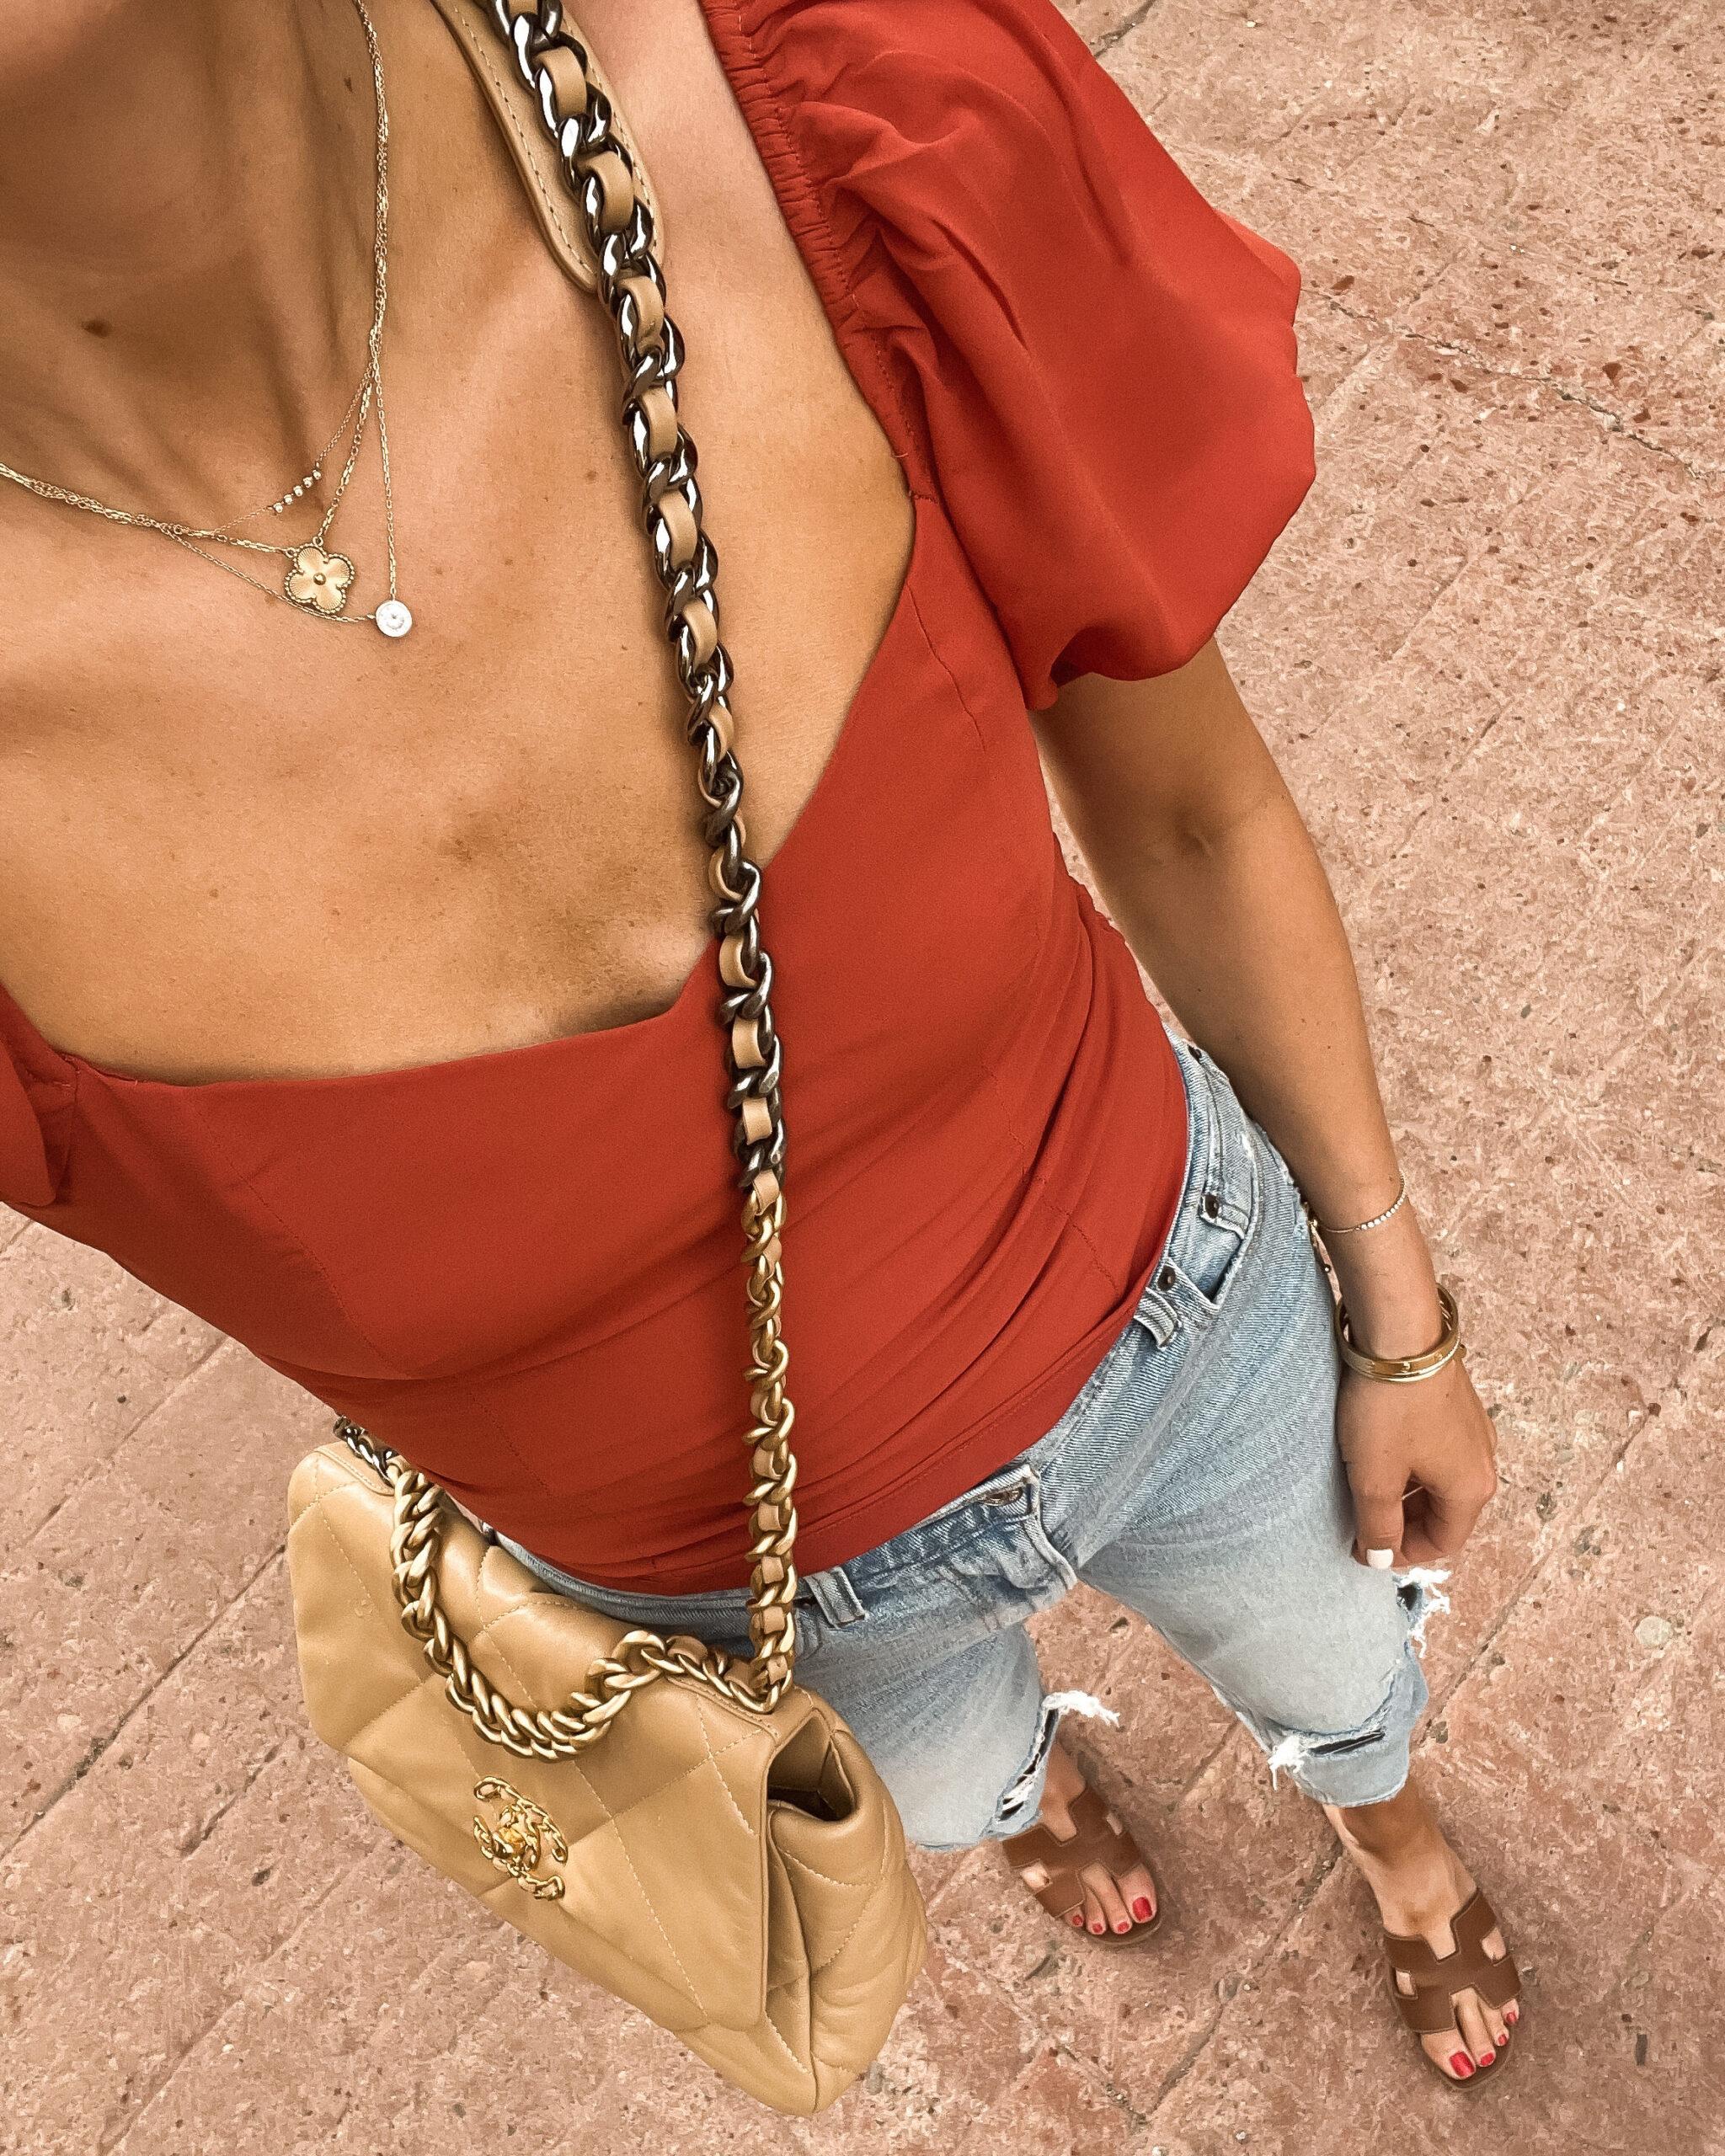 Fashion Jackson Wearing Aberceombie Red Puff Sleeve Top Abercombie Ripped Jeans Hermes Oran Tan Sandals Chanel 19 Beige Handbag